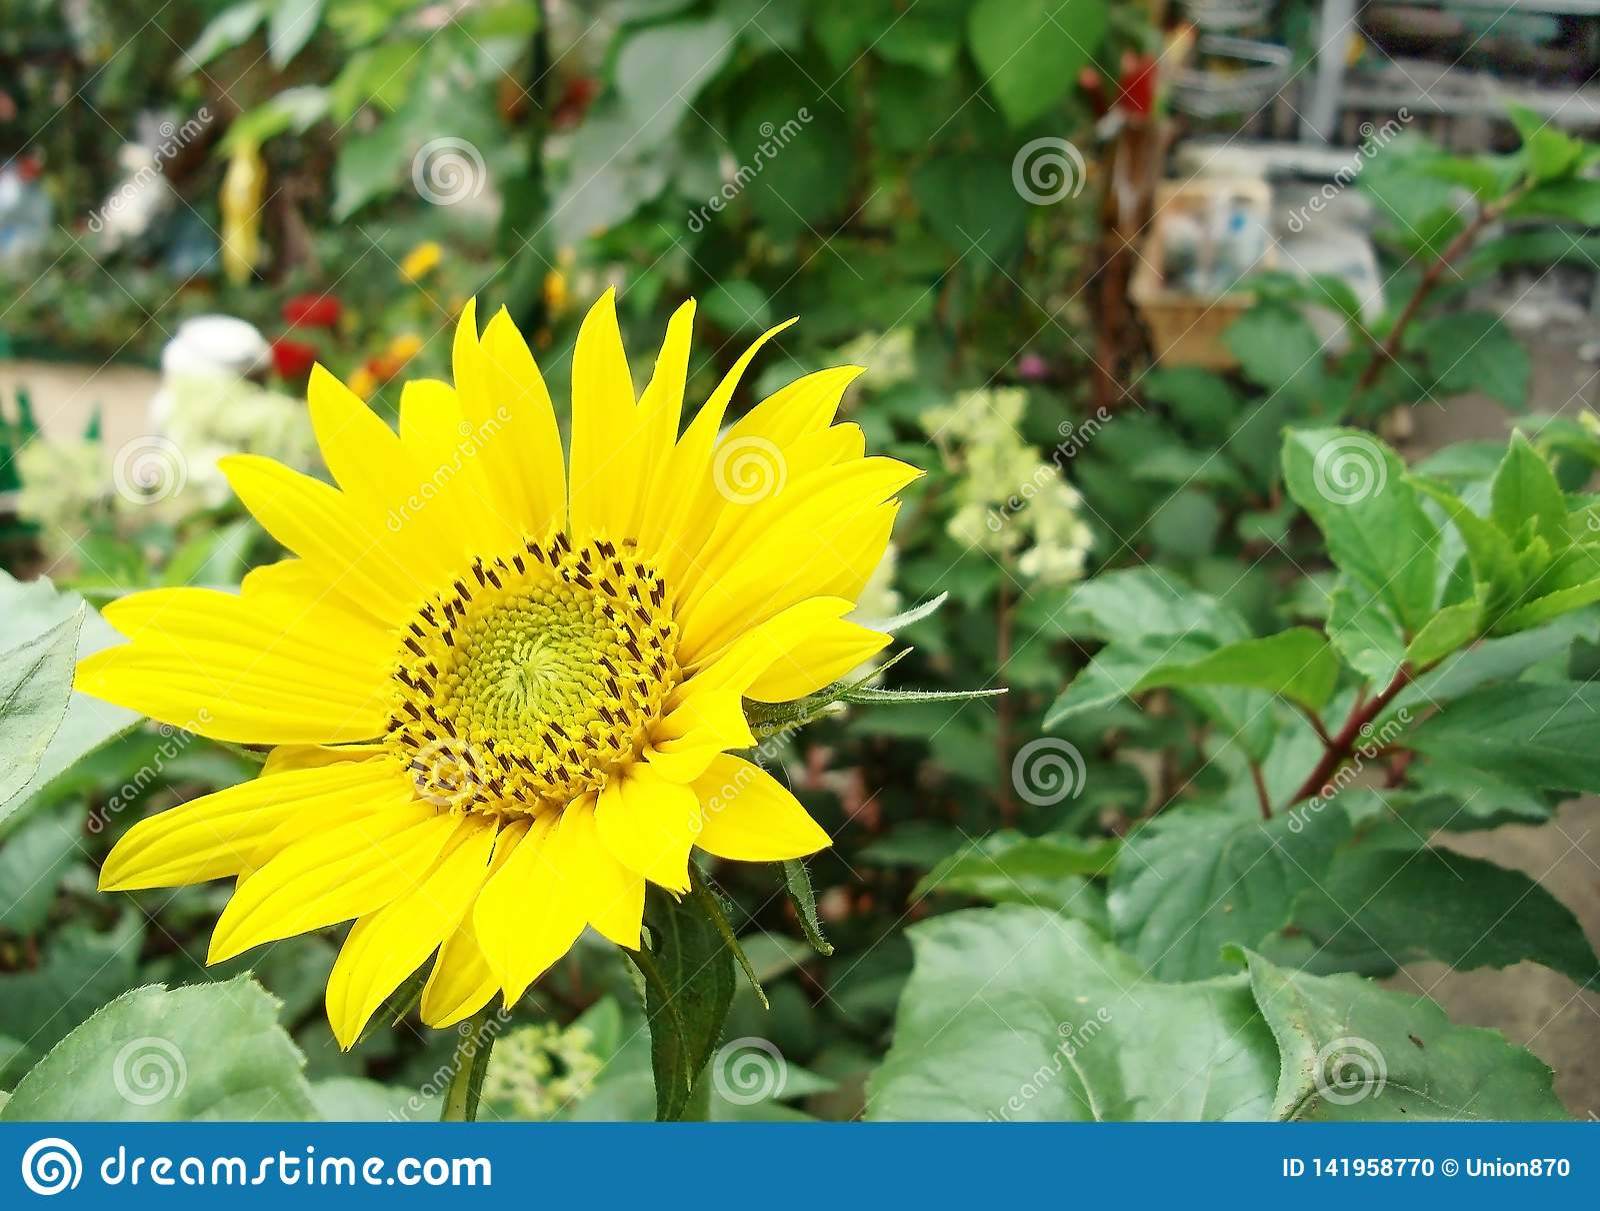 Flowering sunflower on a background of the summer garden